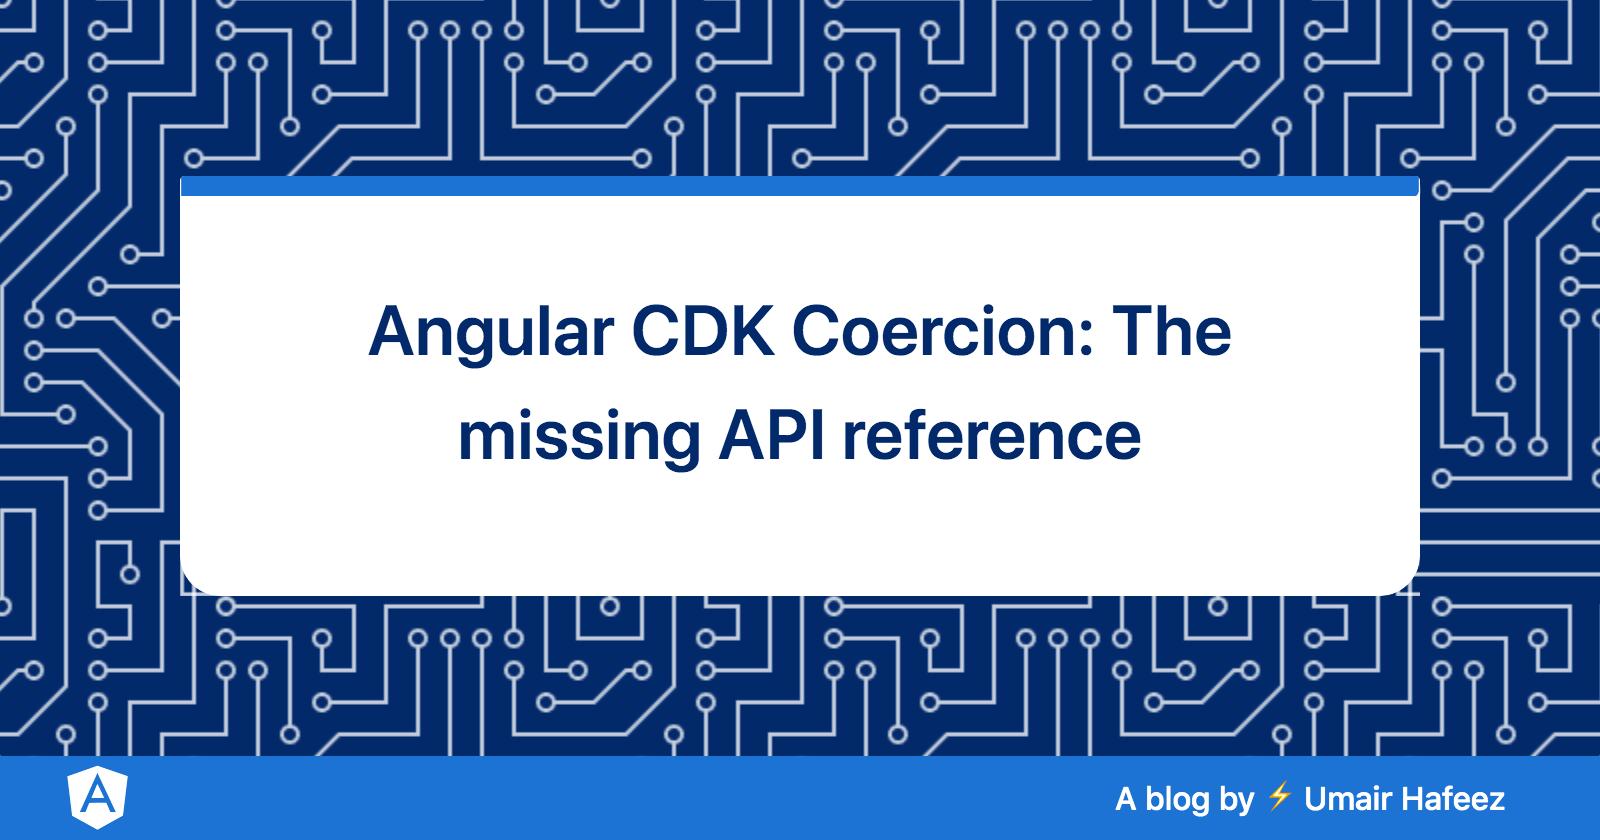 Angular CDK Coercion: The missing API reference